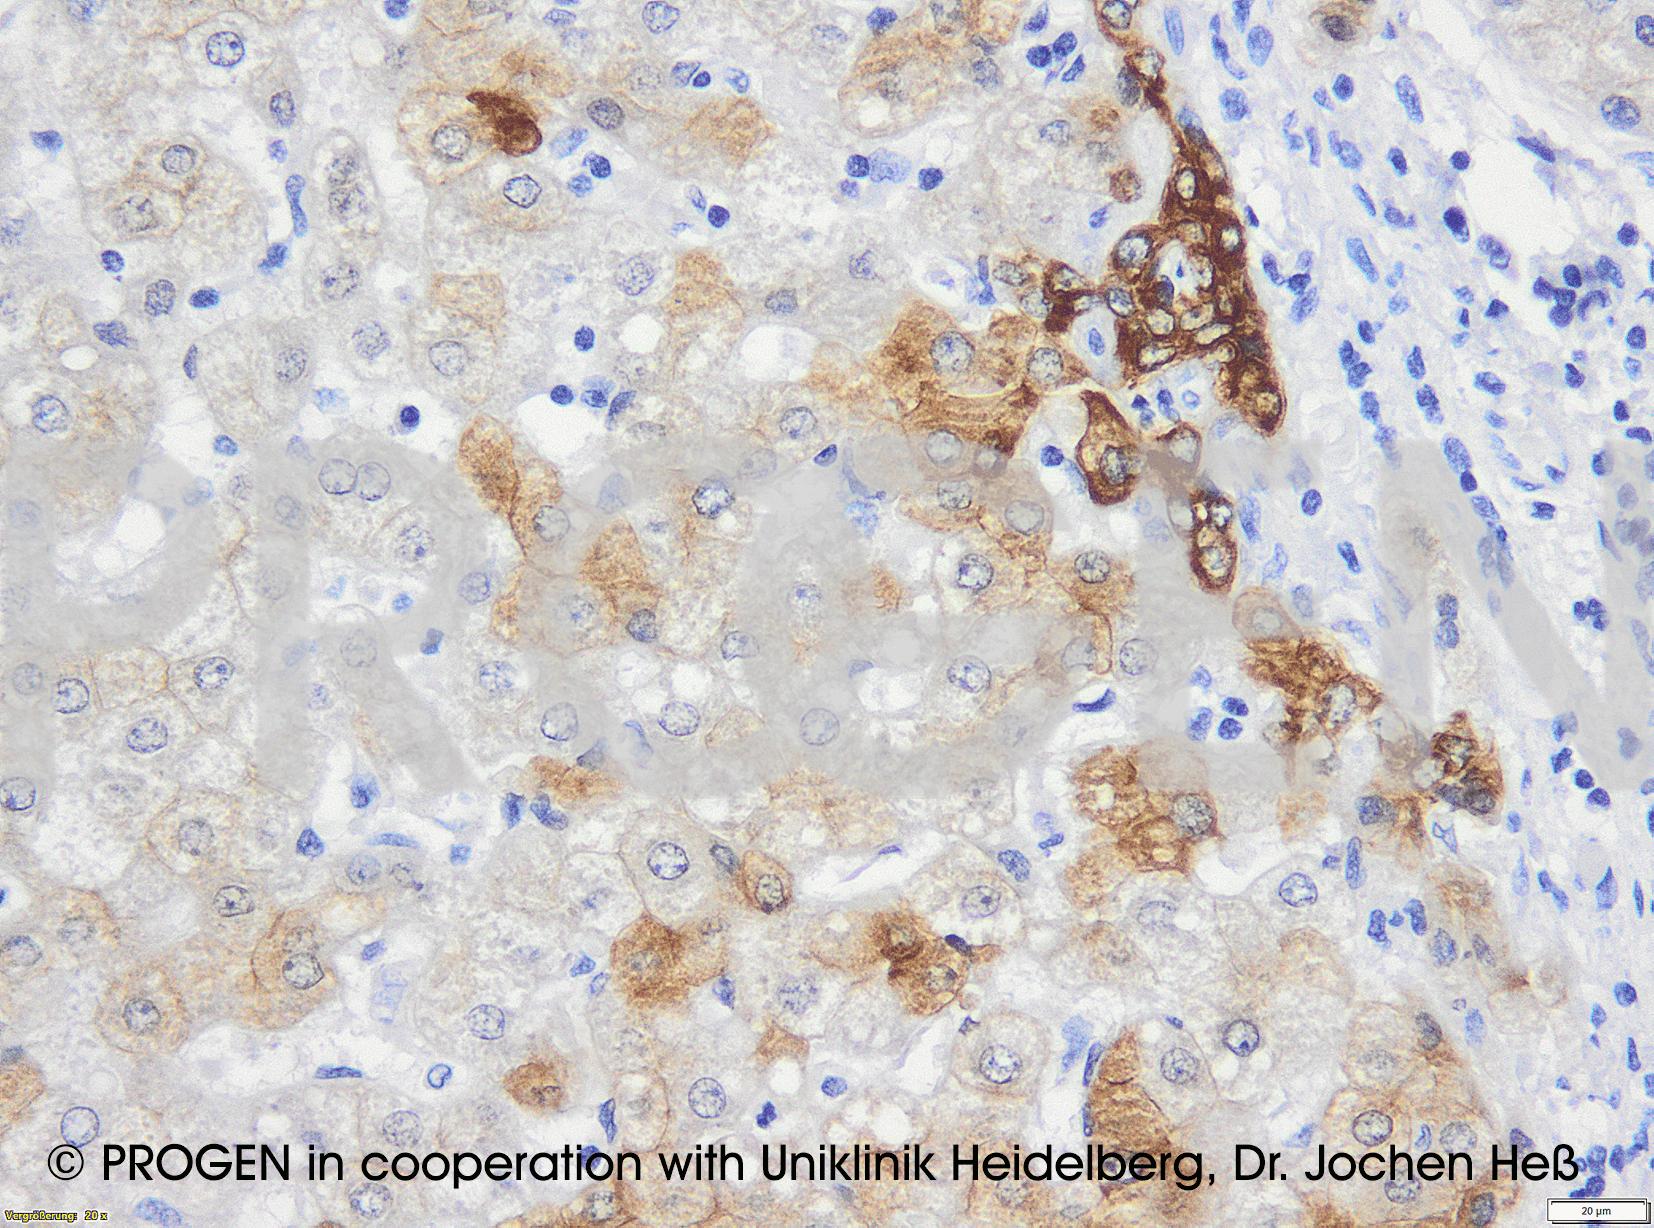 anti-Keratin K18 mouse monoclonal, Ks18.04, purified, sample (ready-to-use)